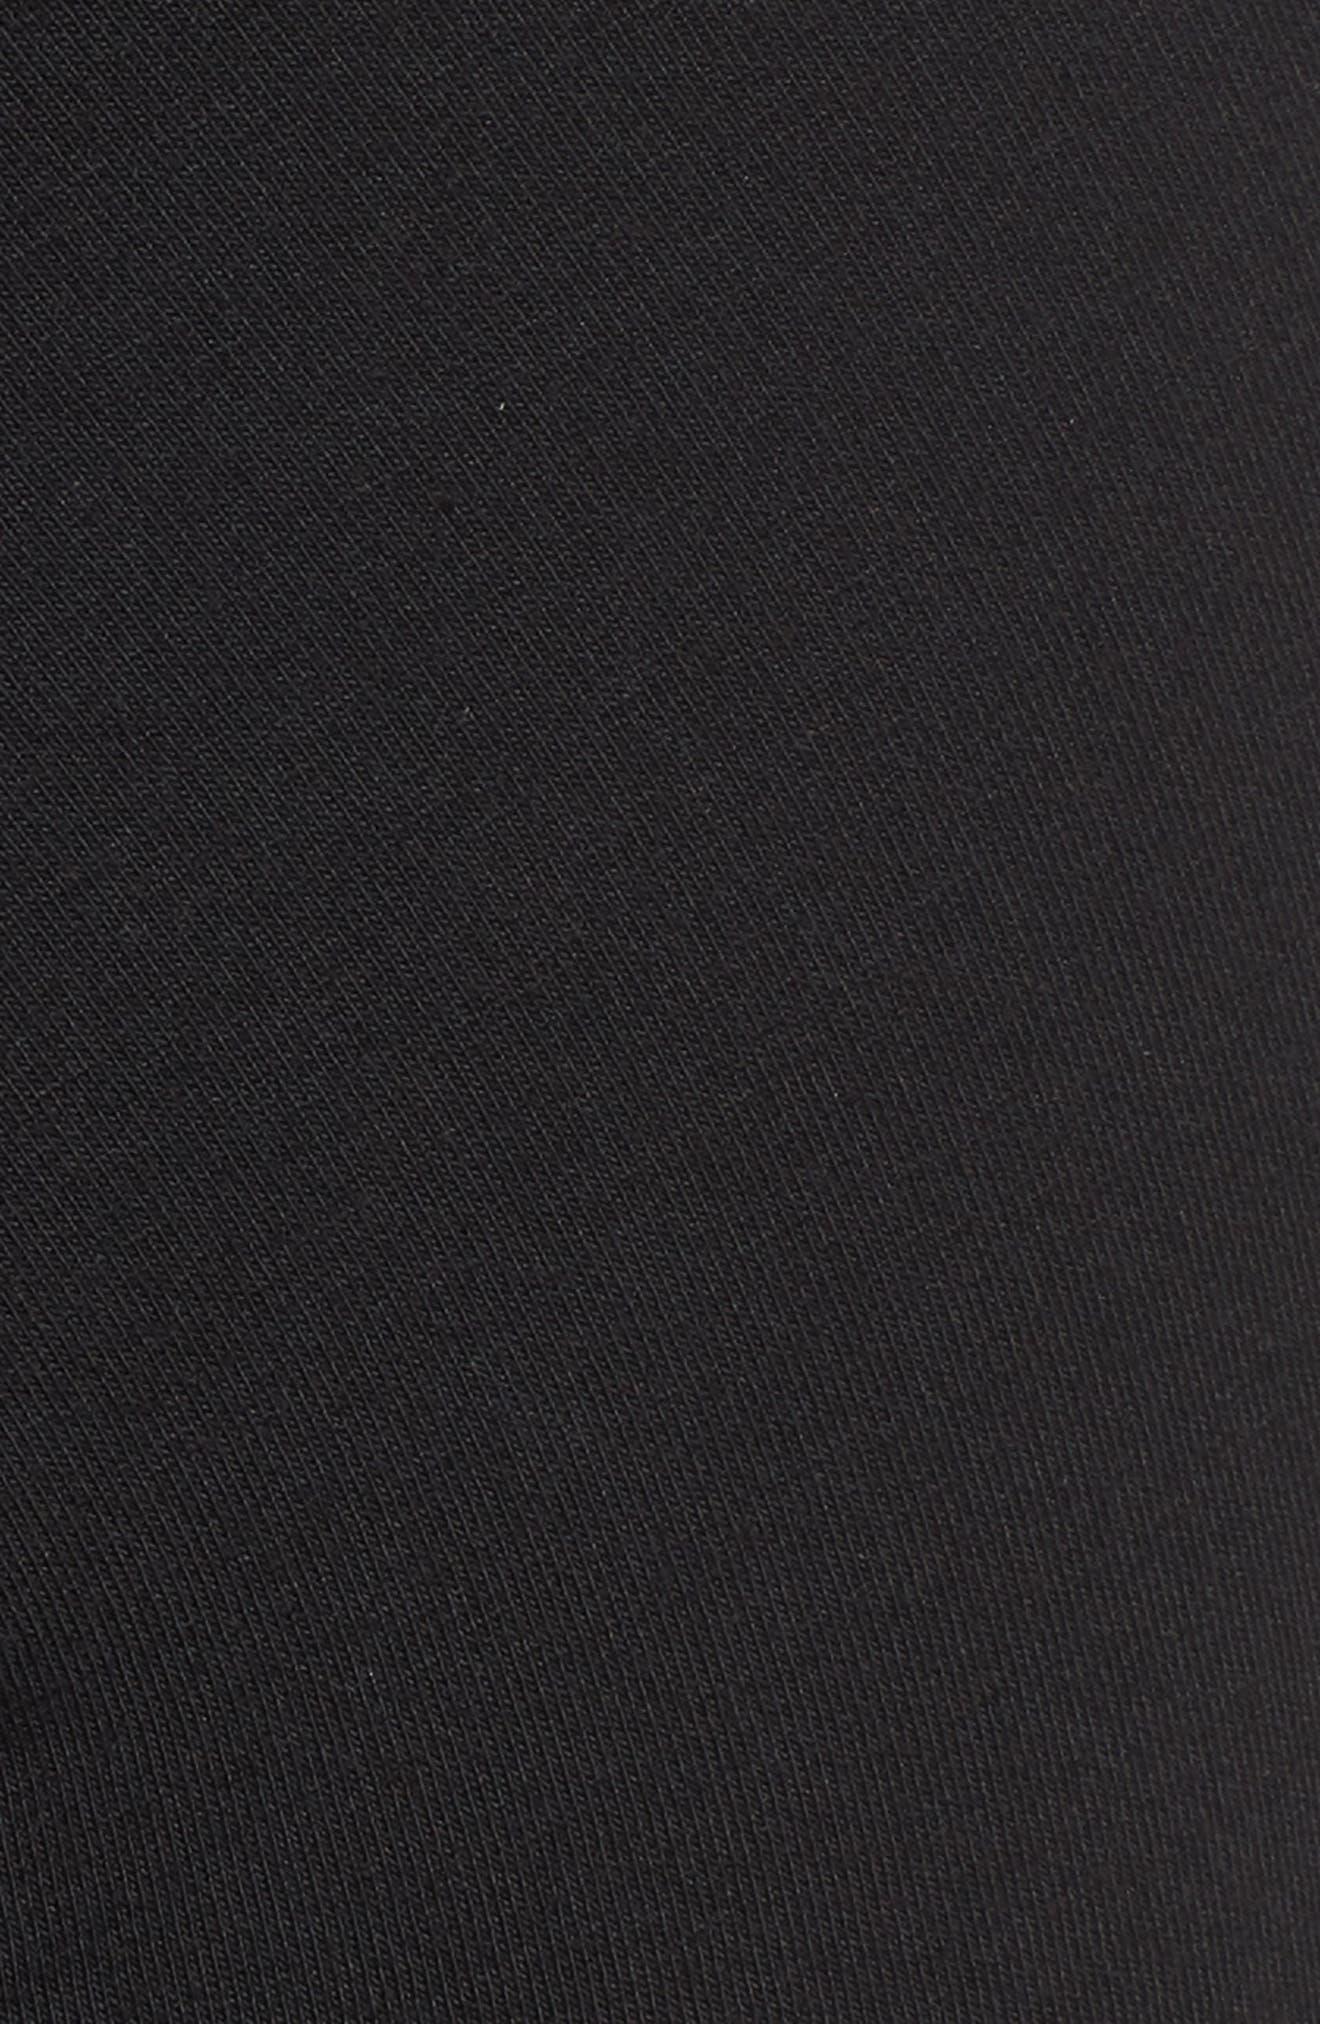 Low Rise Trunks,                             Alternate thumbnail 5, color,                             BLACK/ GOLD